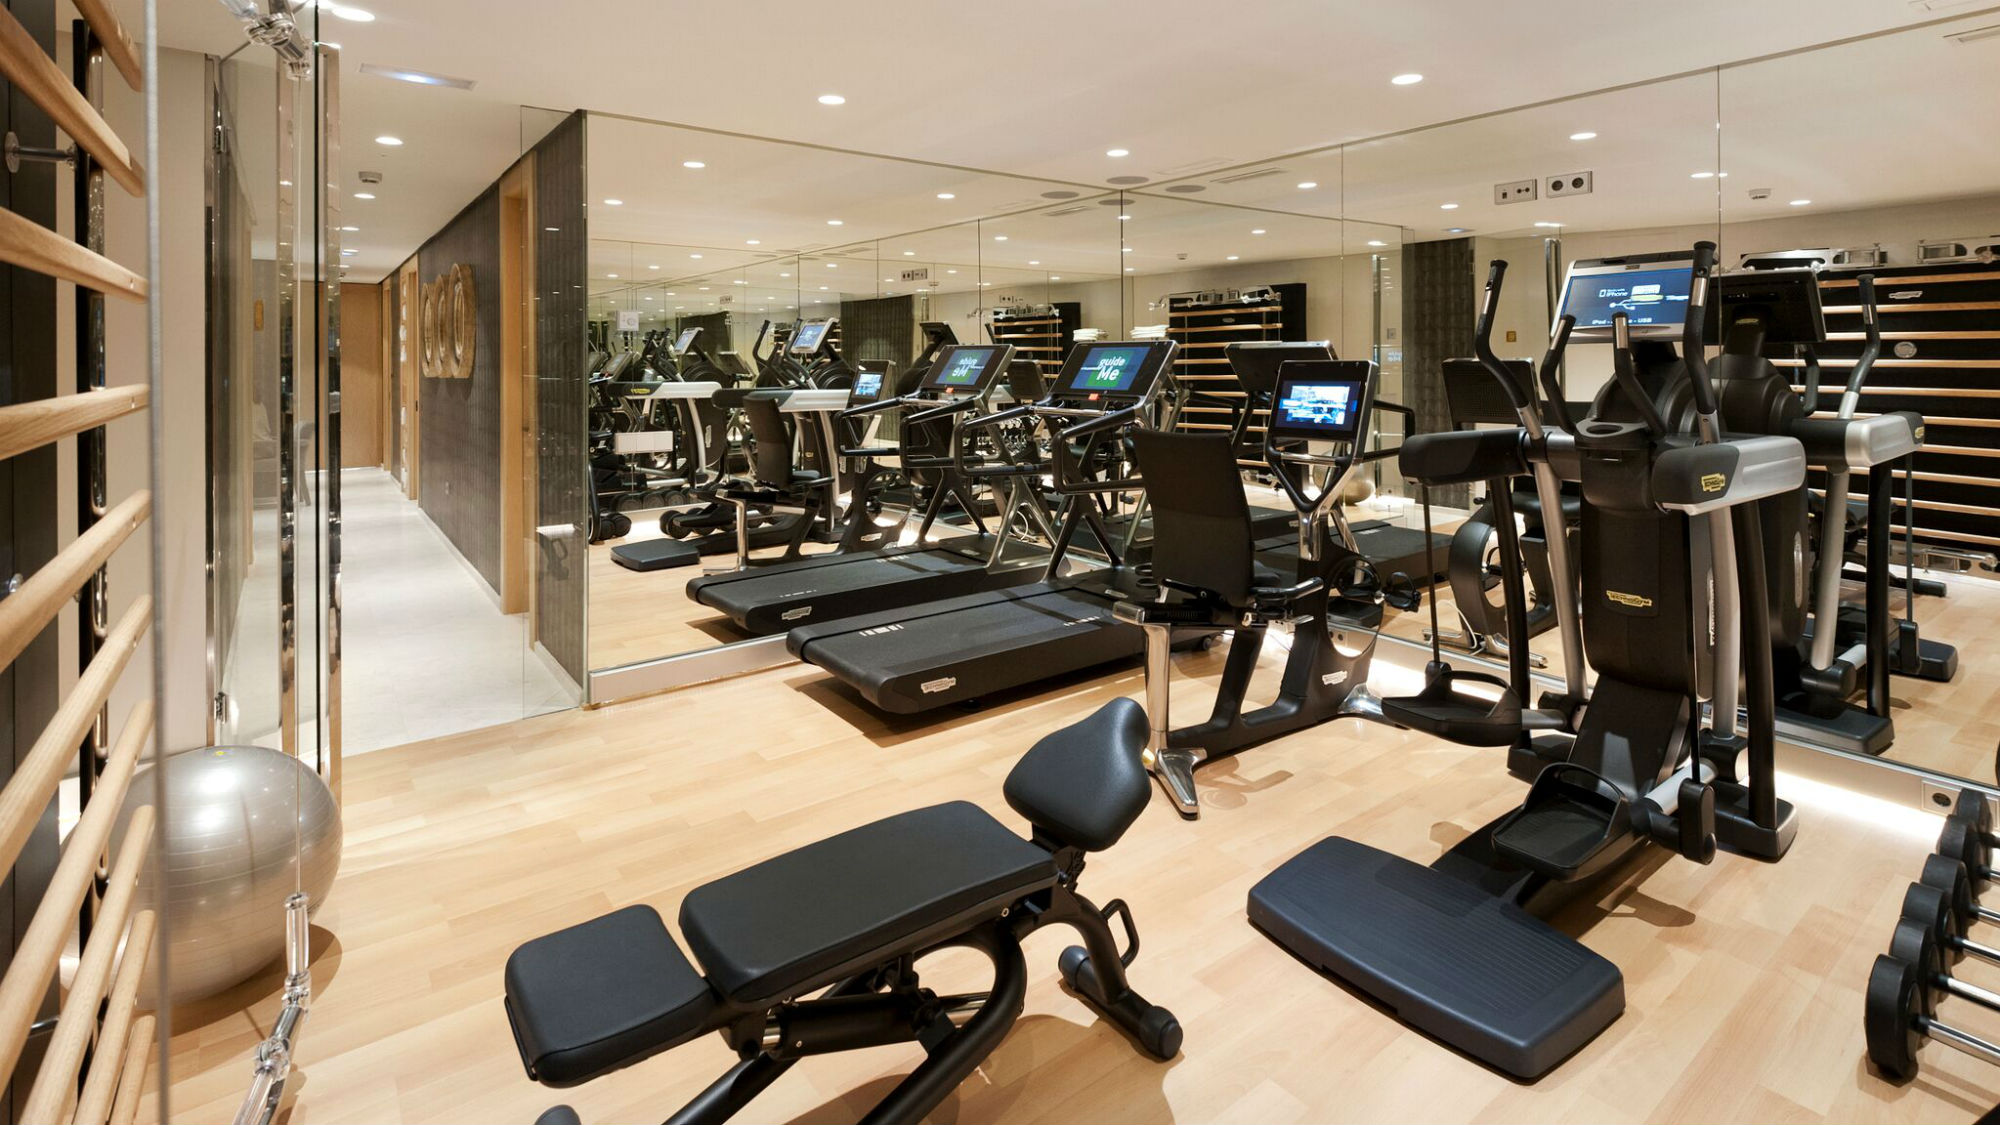 Fitness in sierra nevada latest cardiovascular equipment for Salon equip hotel 2017